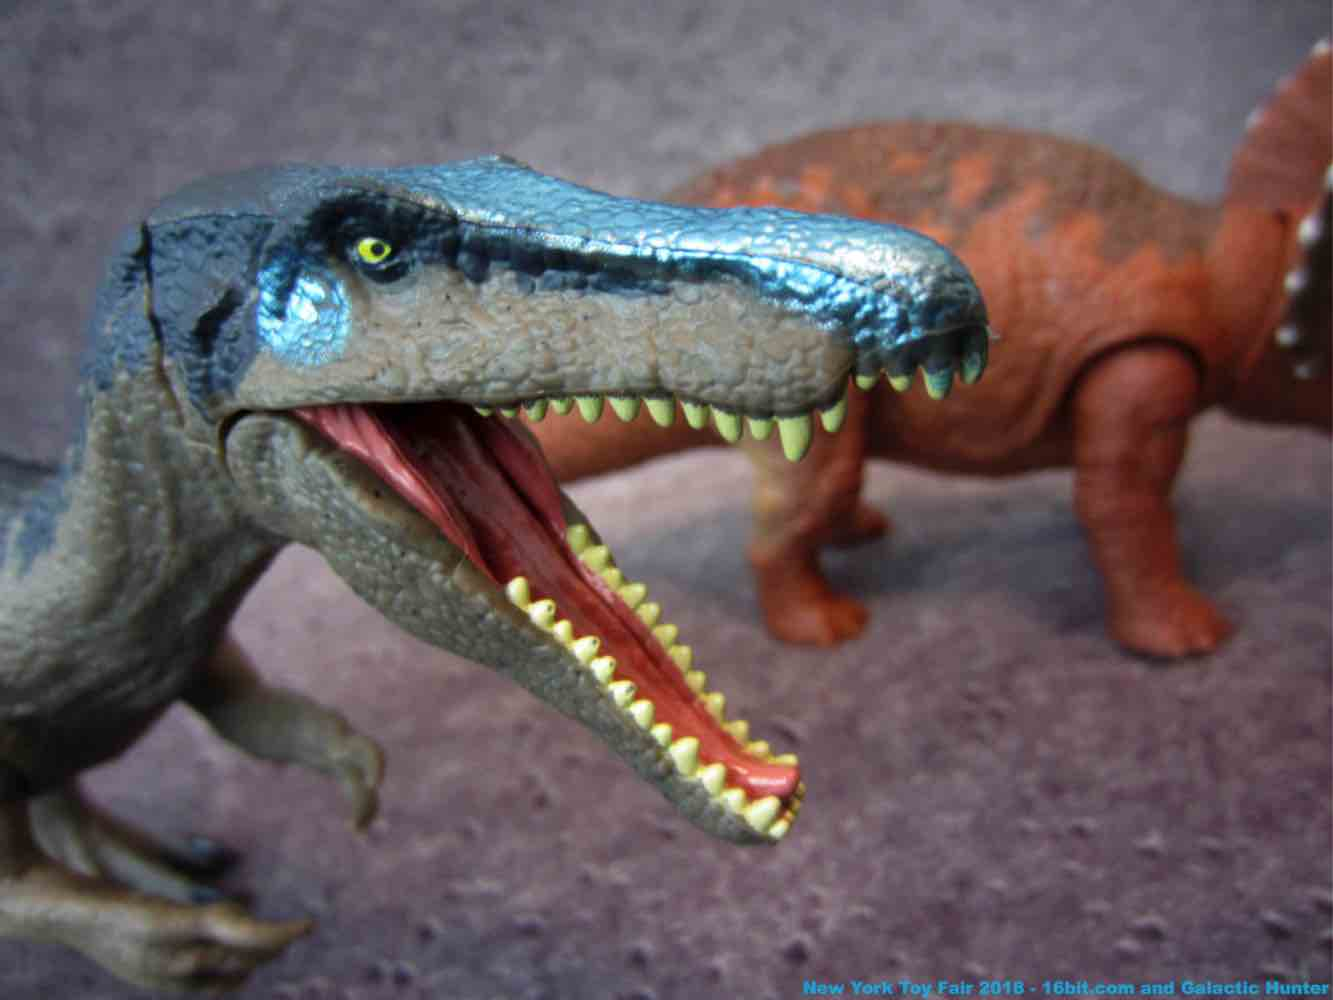 16bit Com Toy Fair Coverage Of Mattel Jurassic World